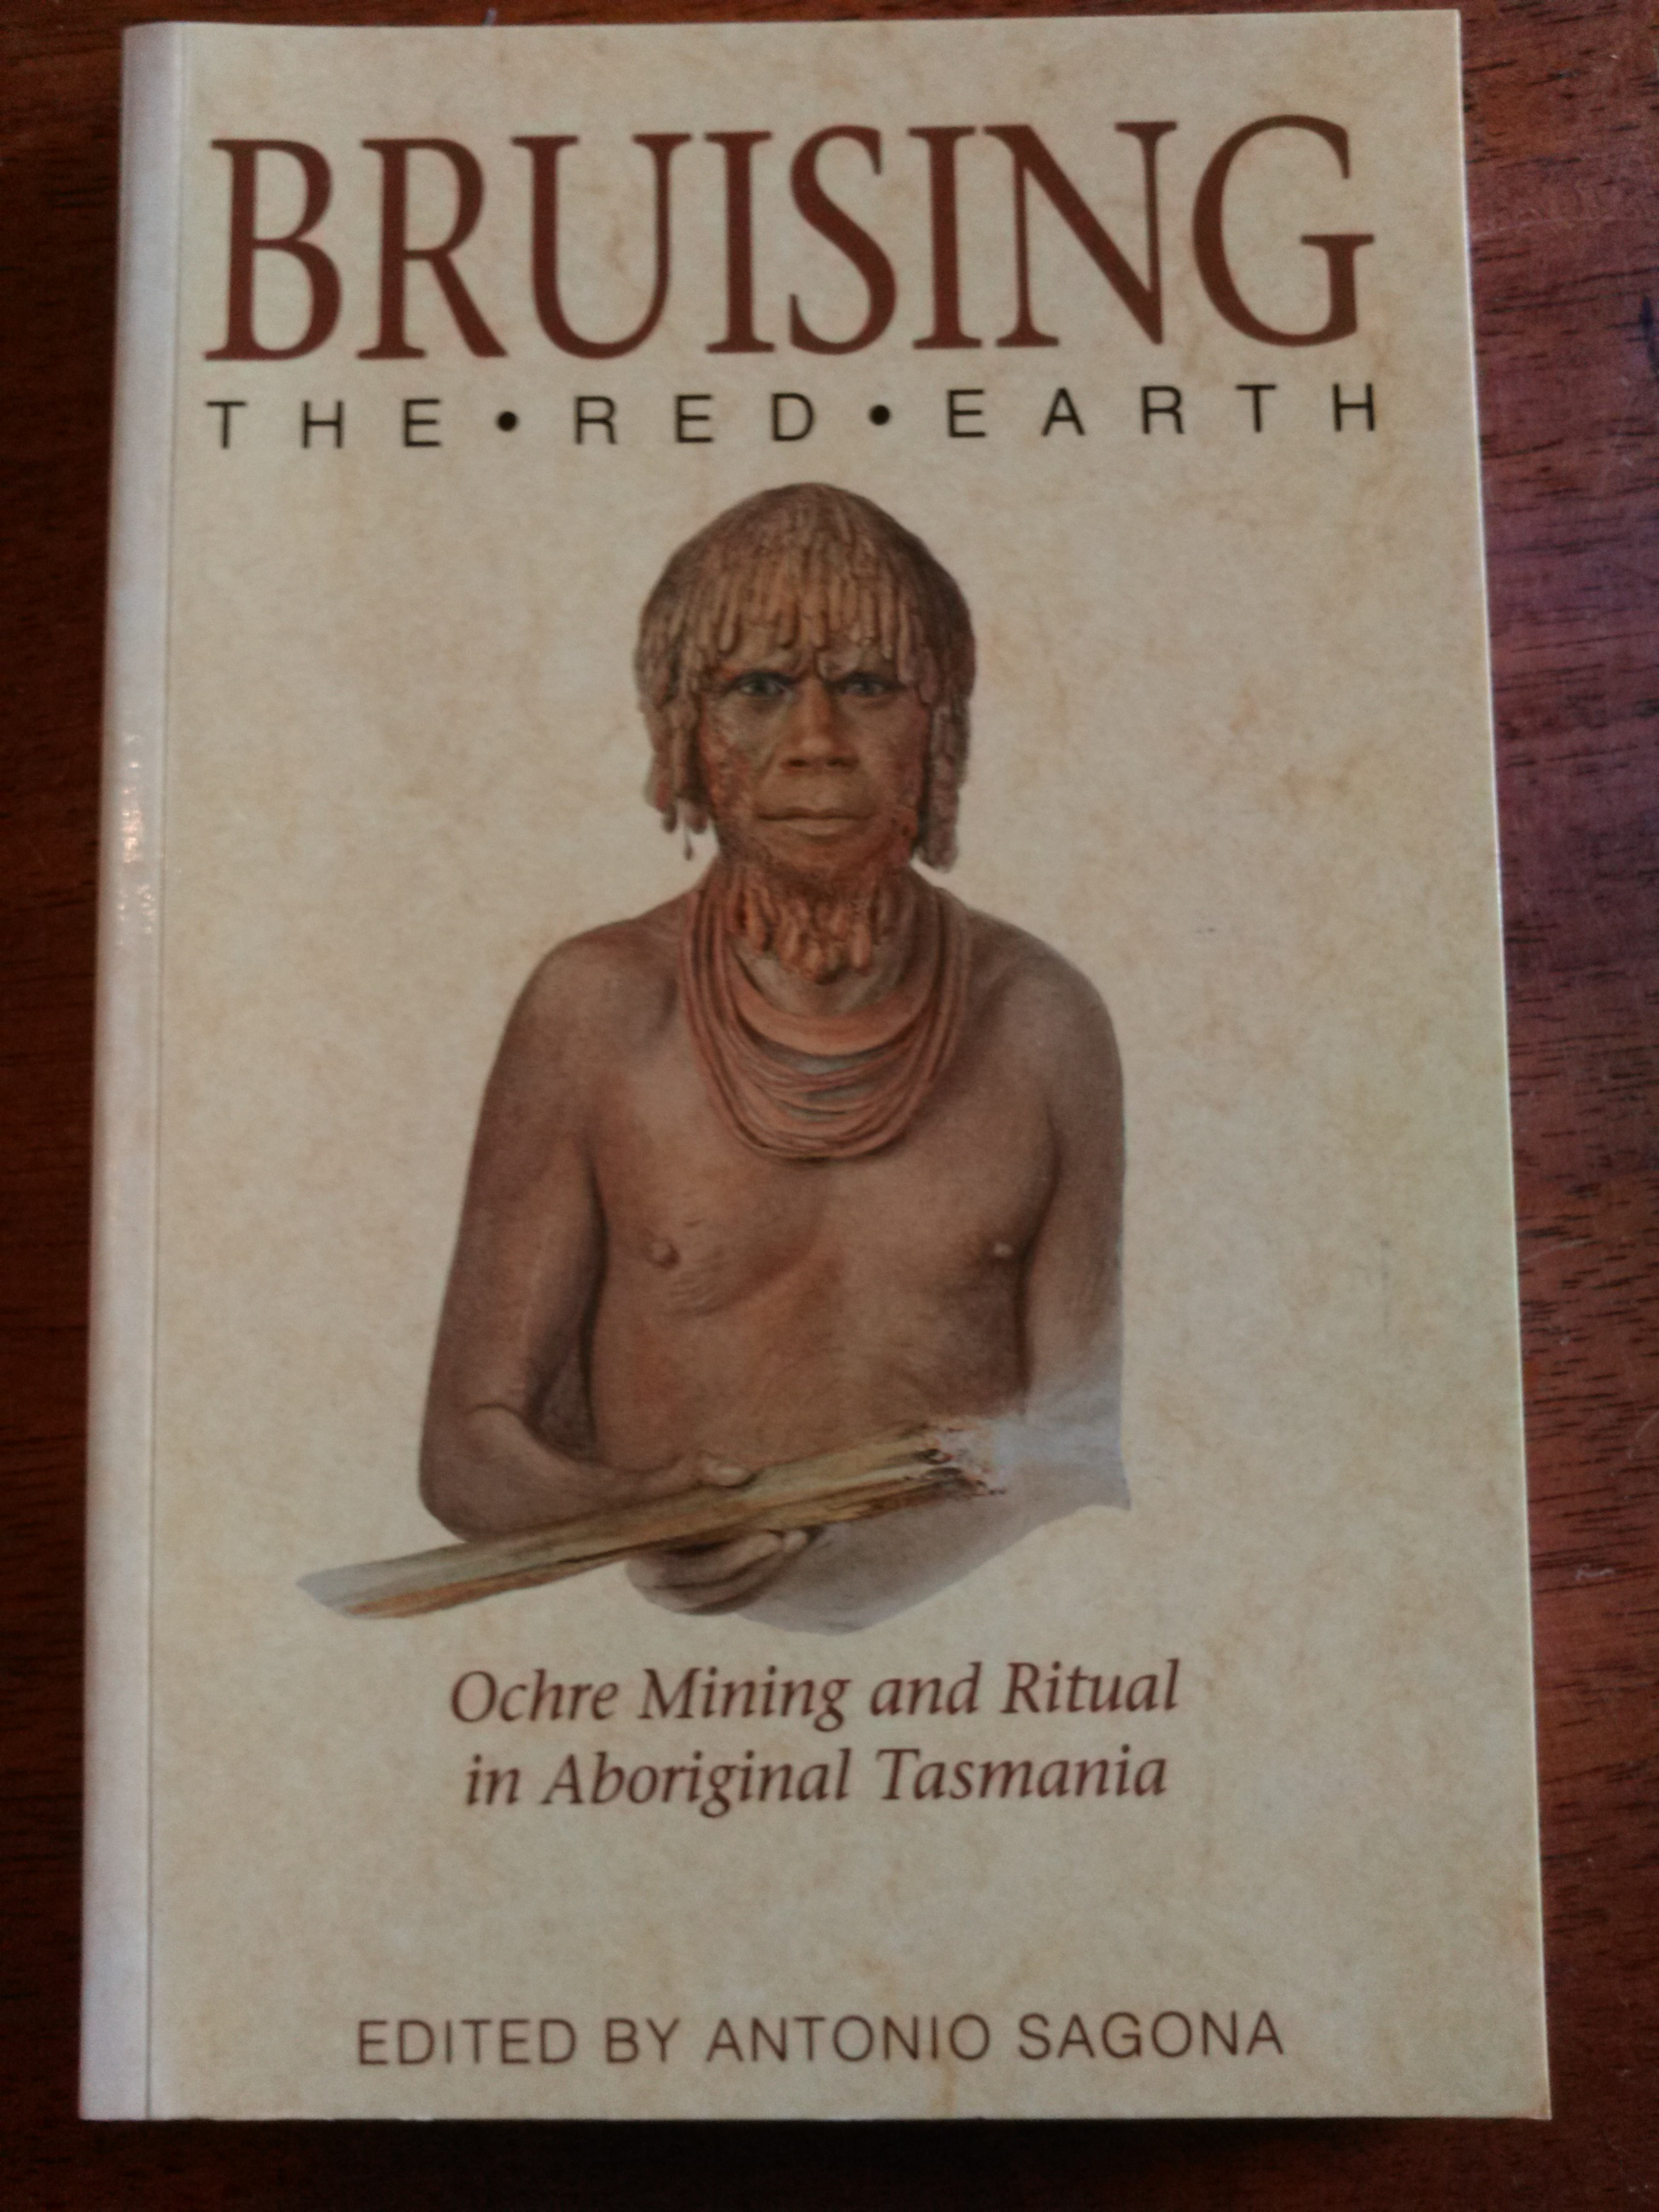 Bruising The Red Earth - Ochre mining and ritual in Aboriginal Tasmania